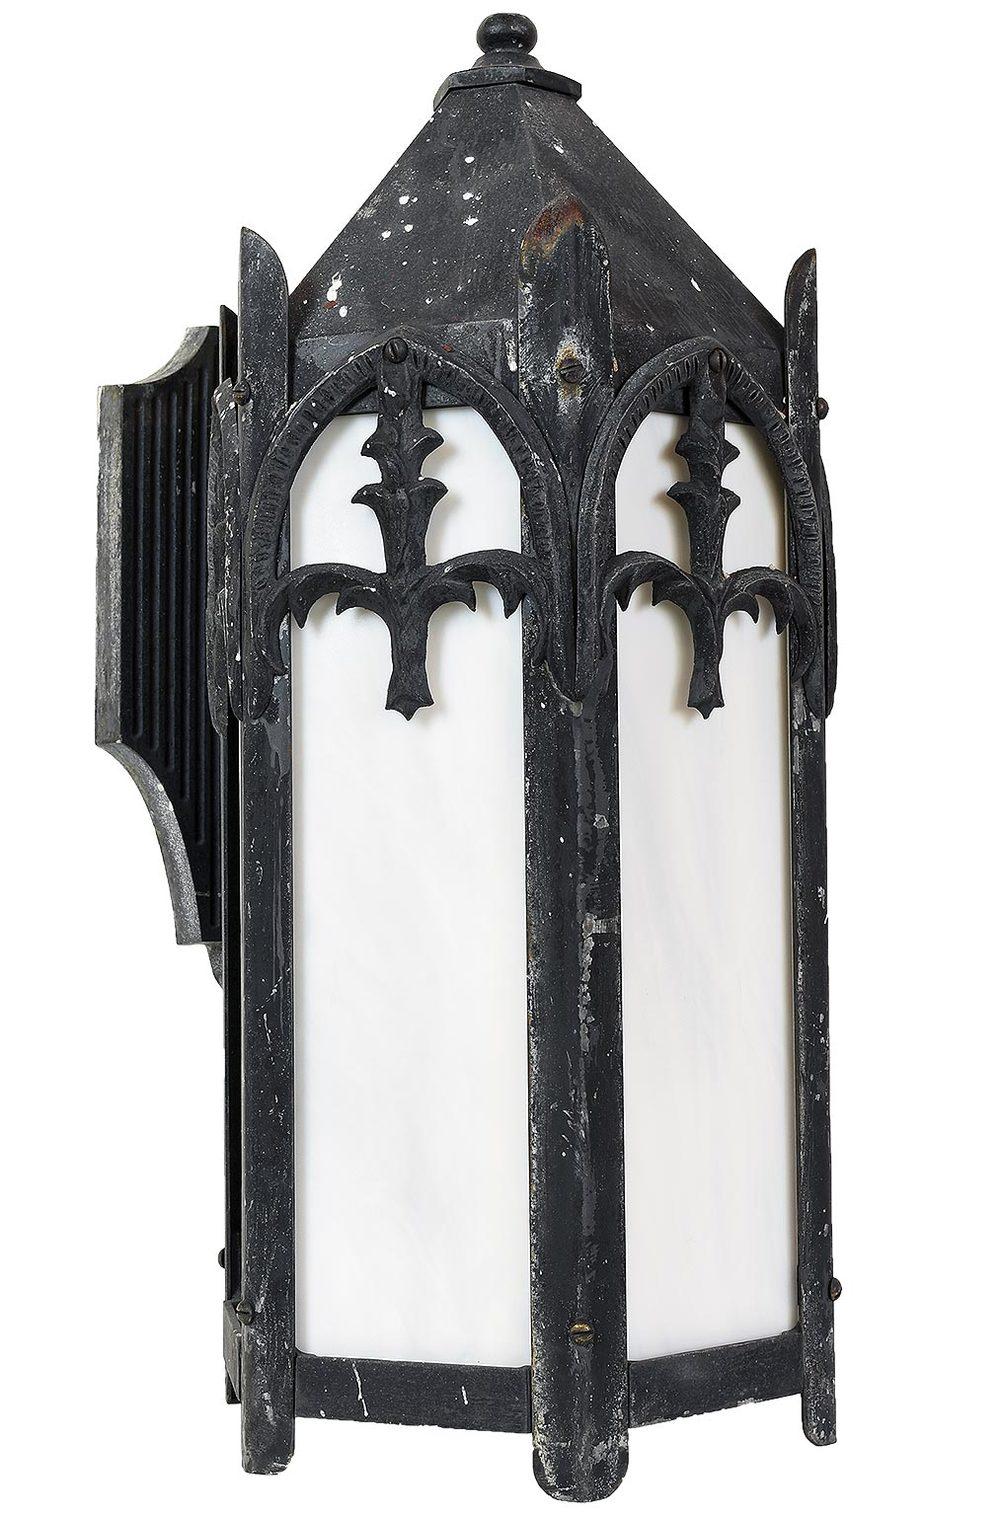 45952-gothic-exterior-sconce.jpg